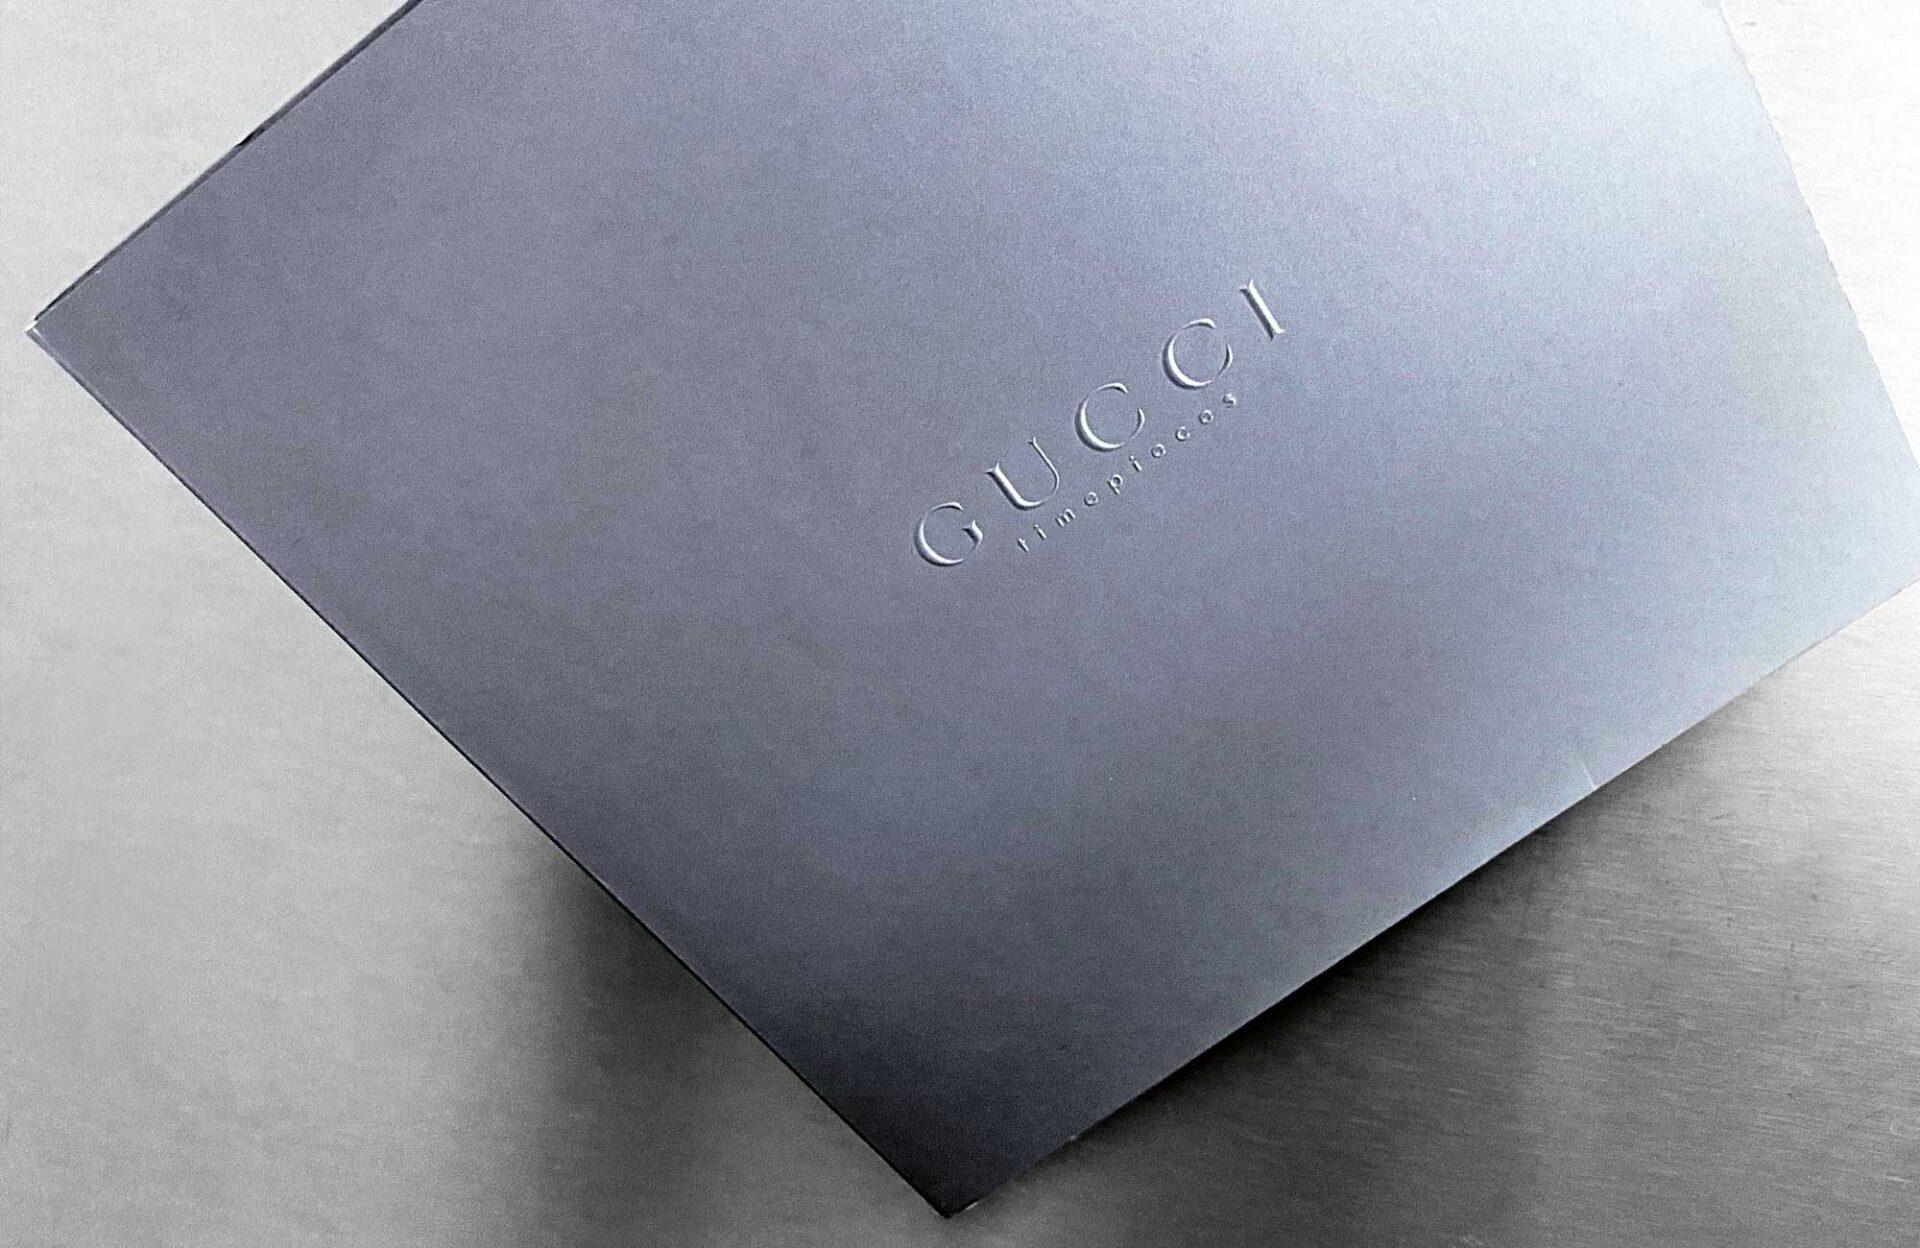 Brand_Gucci_©loup.ch_1